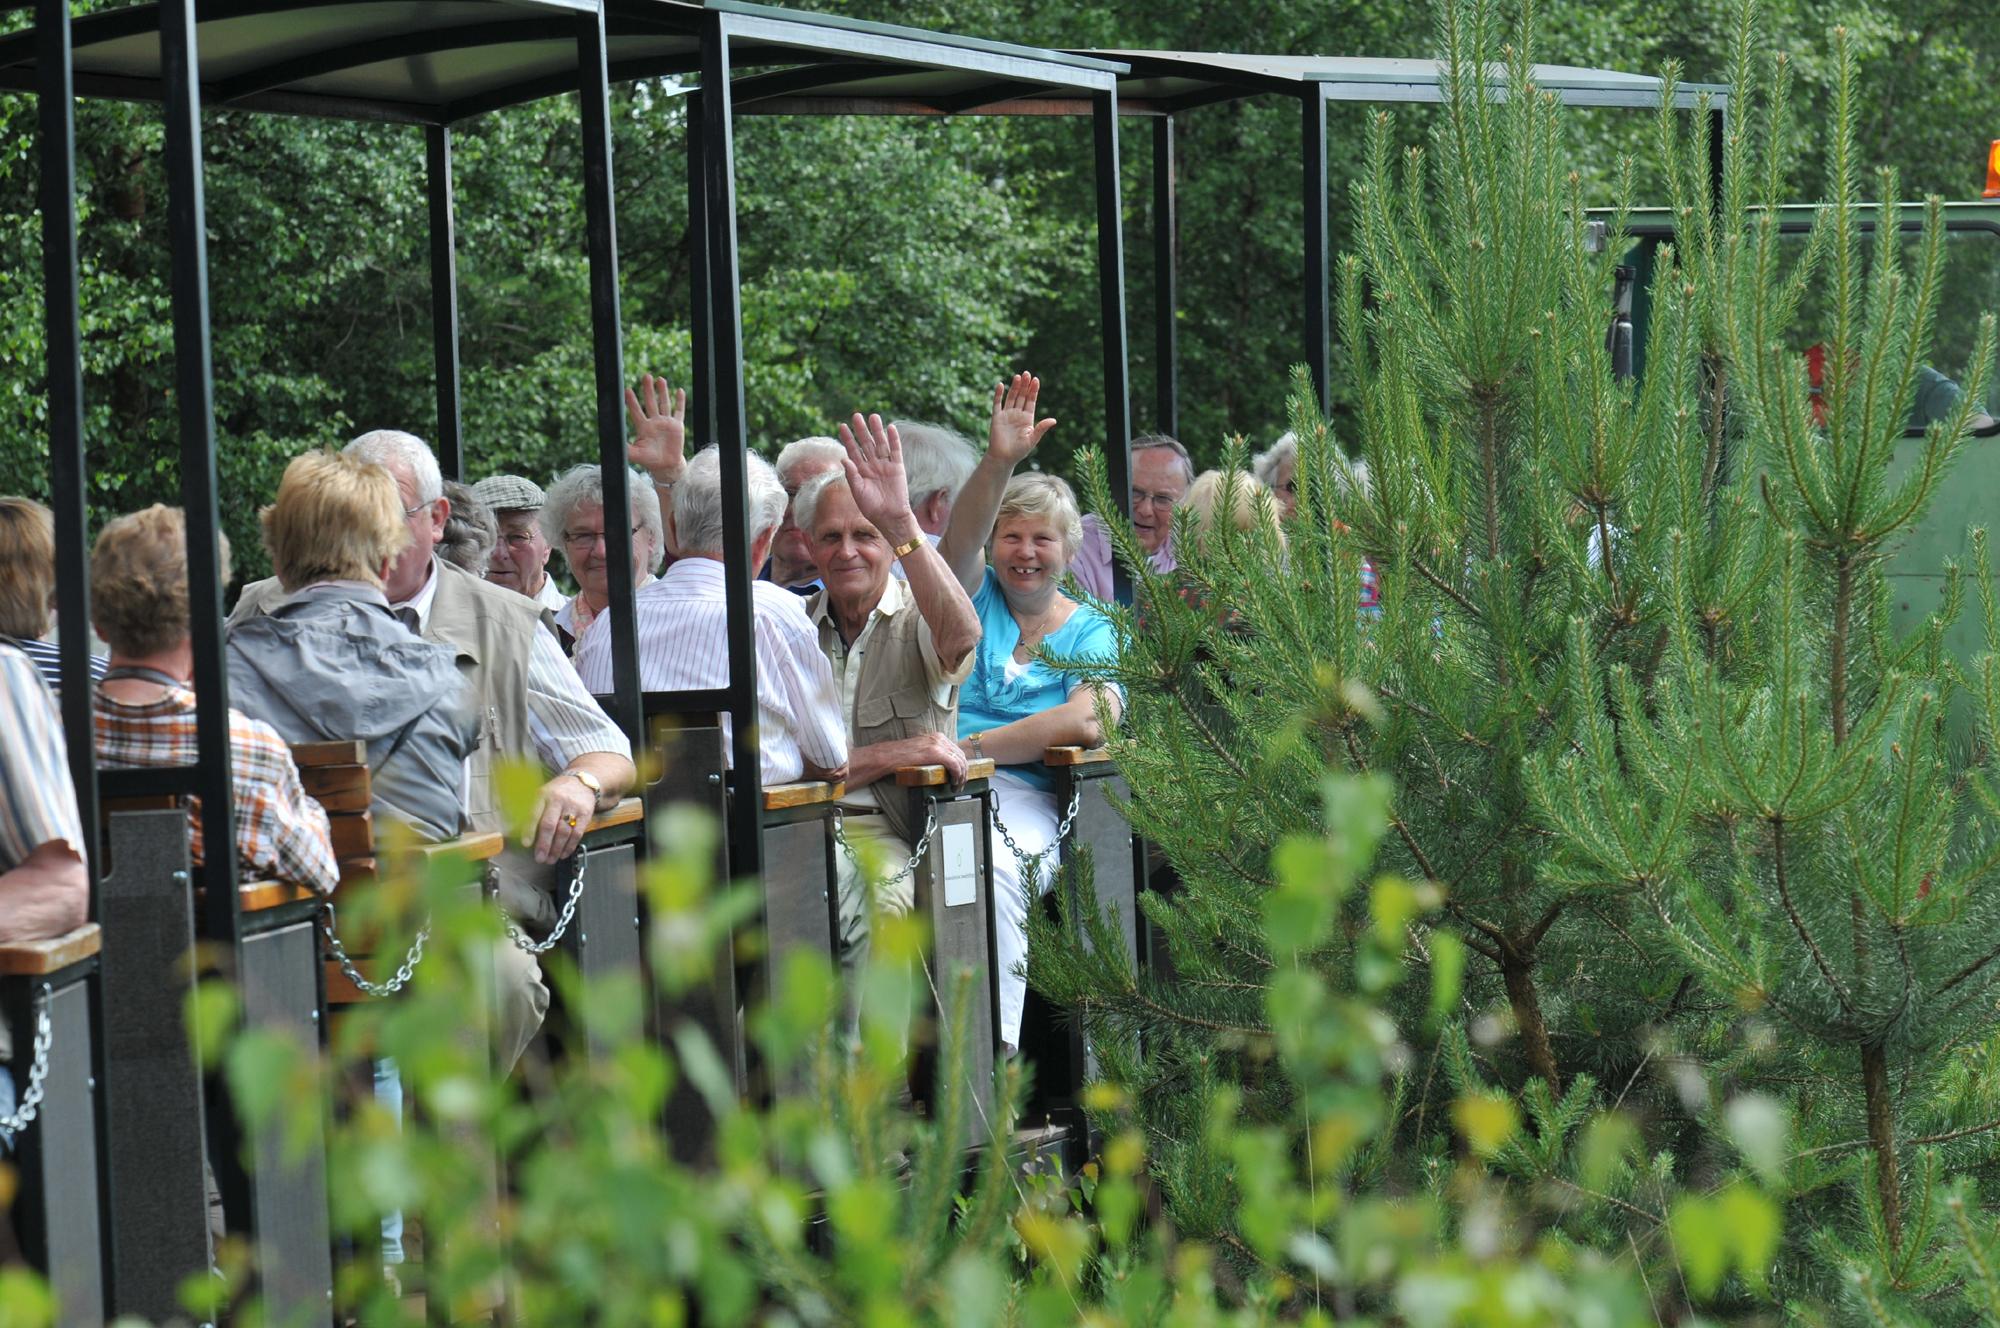 Gruppe auf Moorbahntour ins Große Moor in Westerbeck